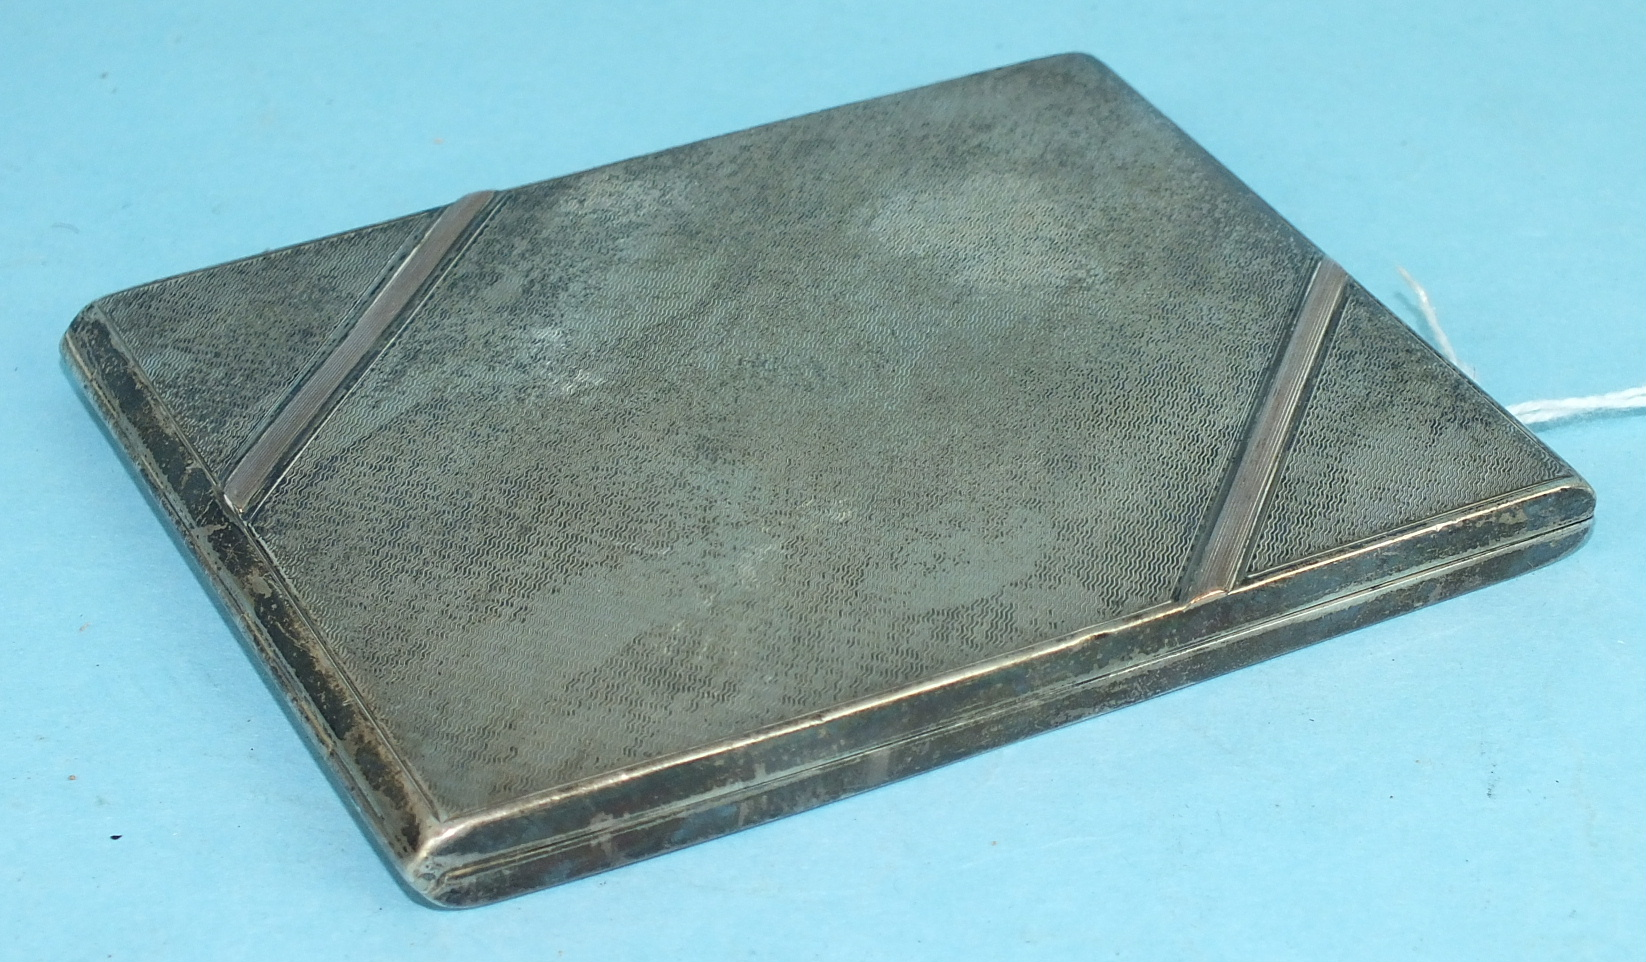 Lot 430 - A silver engine-turned cigarette case, Birmingham 1930, 10.5 x 8.2cm, ___3½oz, (inscribed to